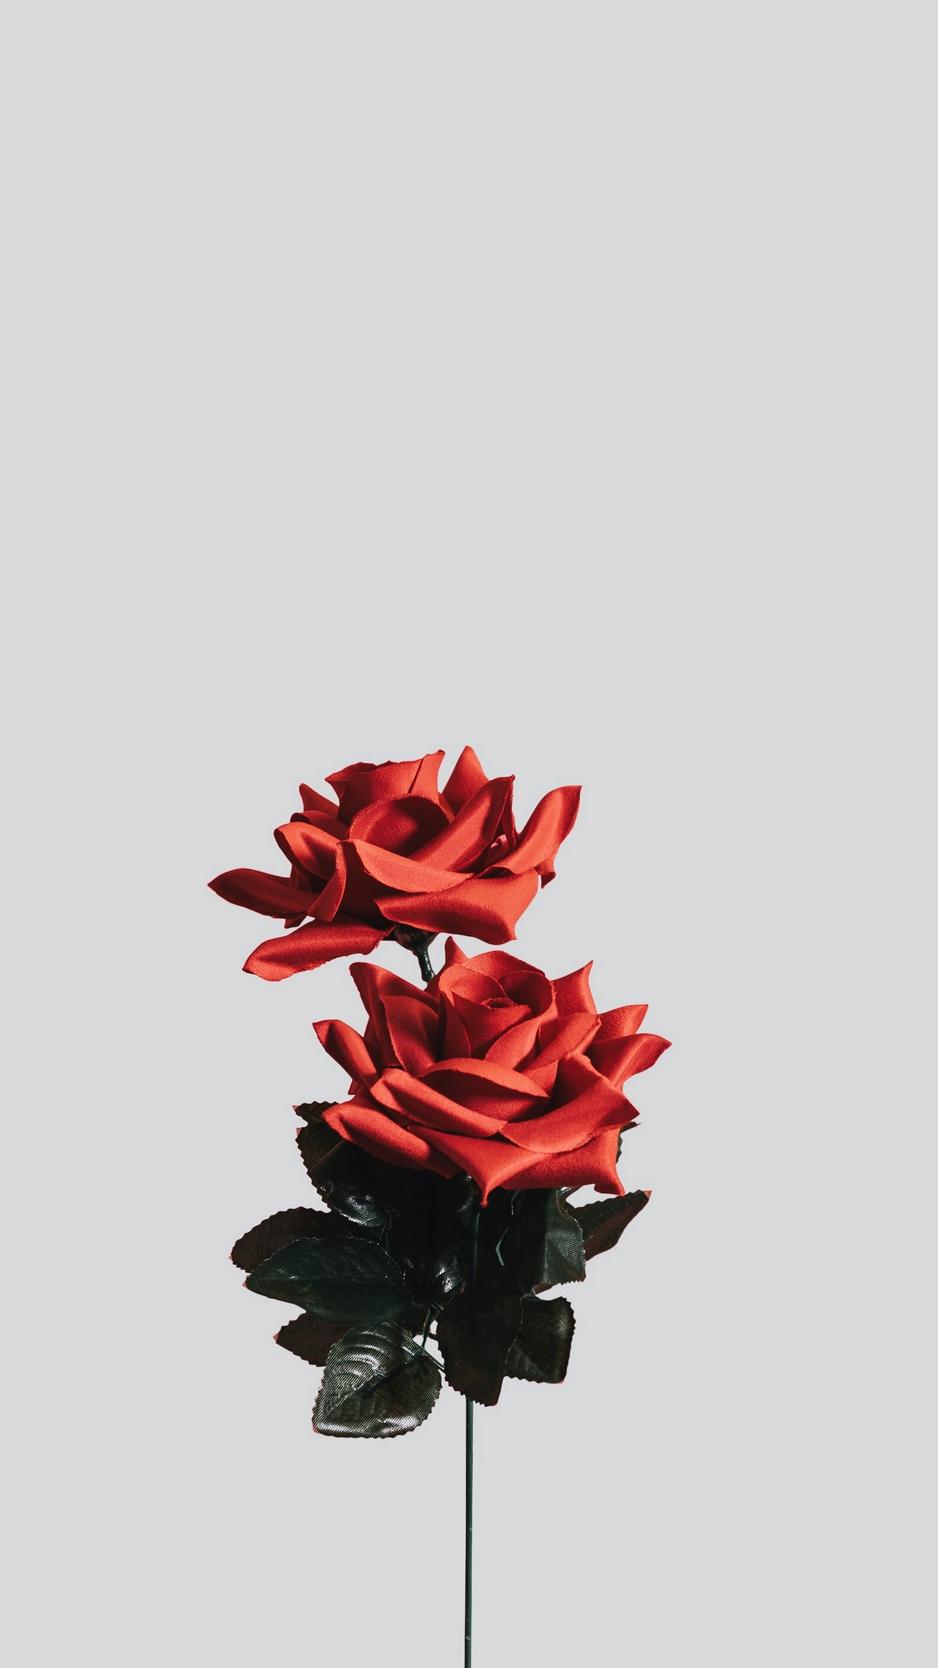 Wallpaper Rose, Flower, Artificial, Minimalism - Minimalist Flower Wallpaper Iphone , HD Wallpaper & Backgrounds